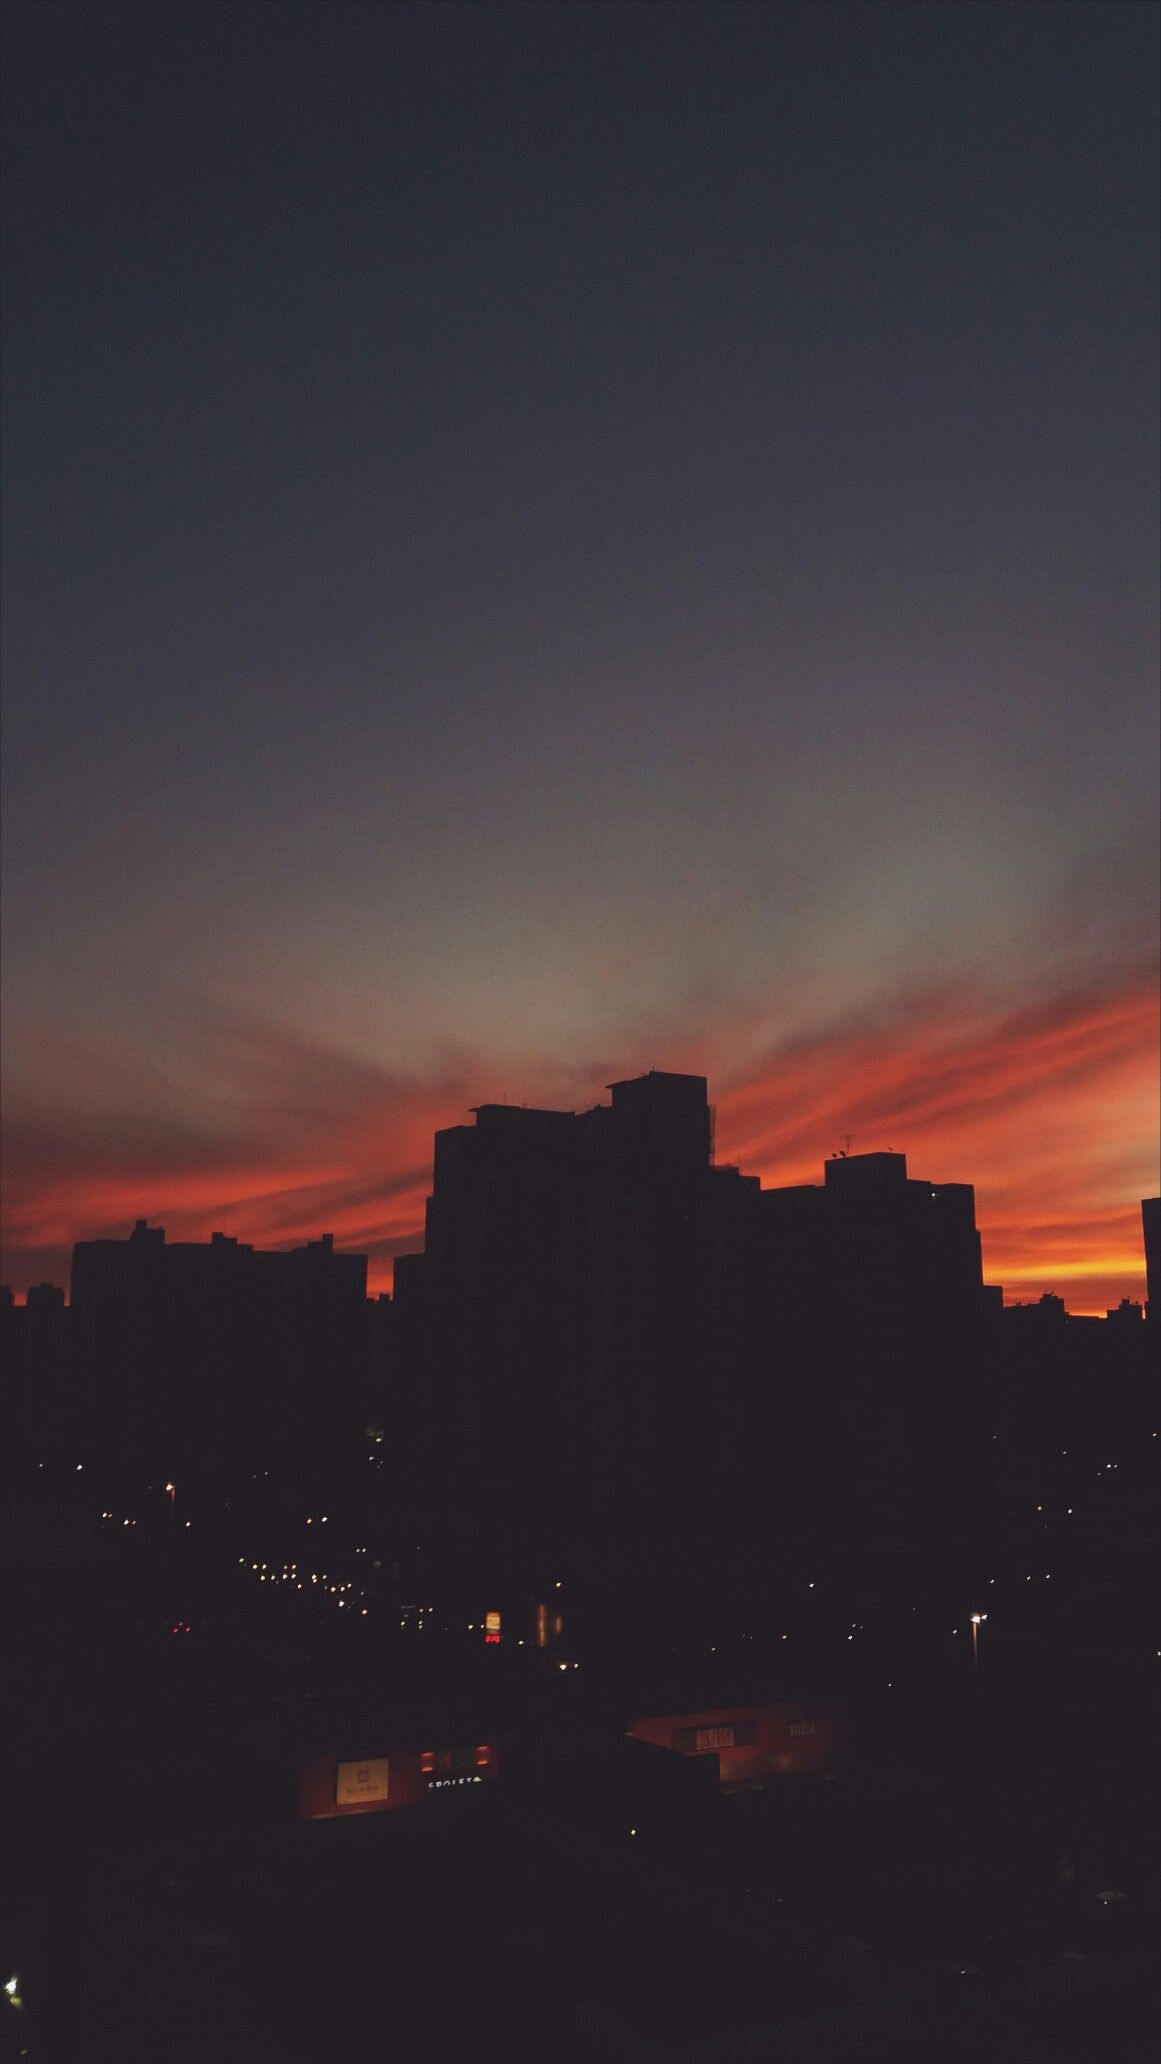 Por Do Sol Em Brasilia Tumblr Wallpaper Fotografia Noturna